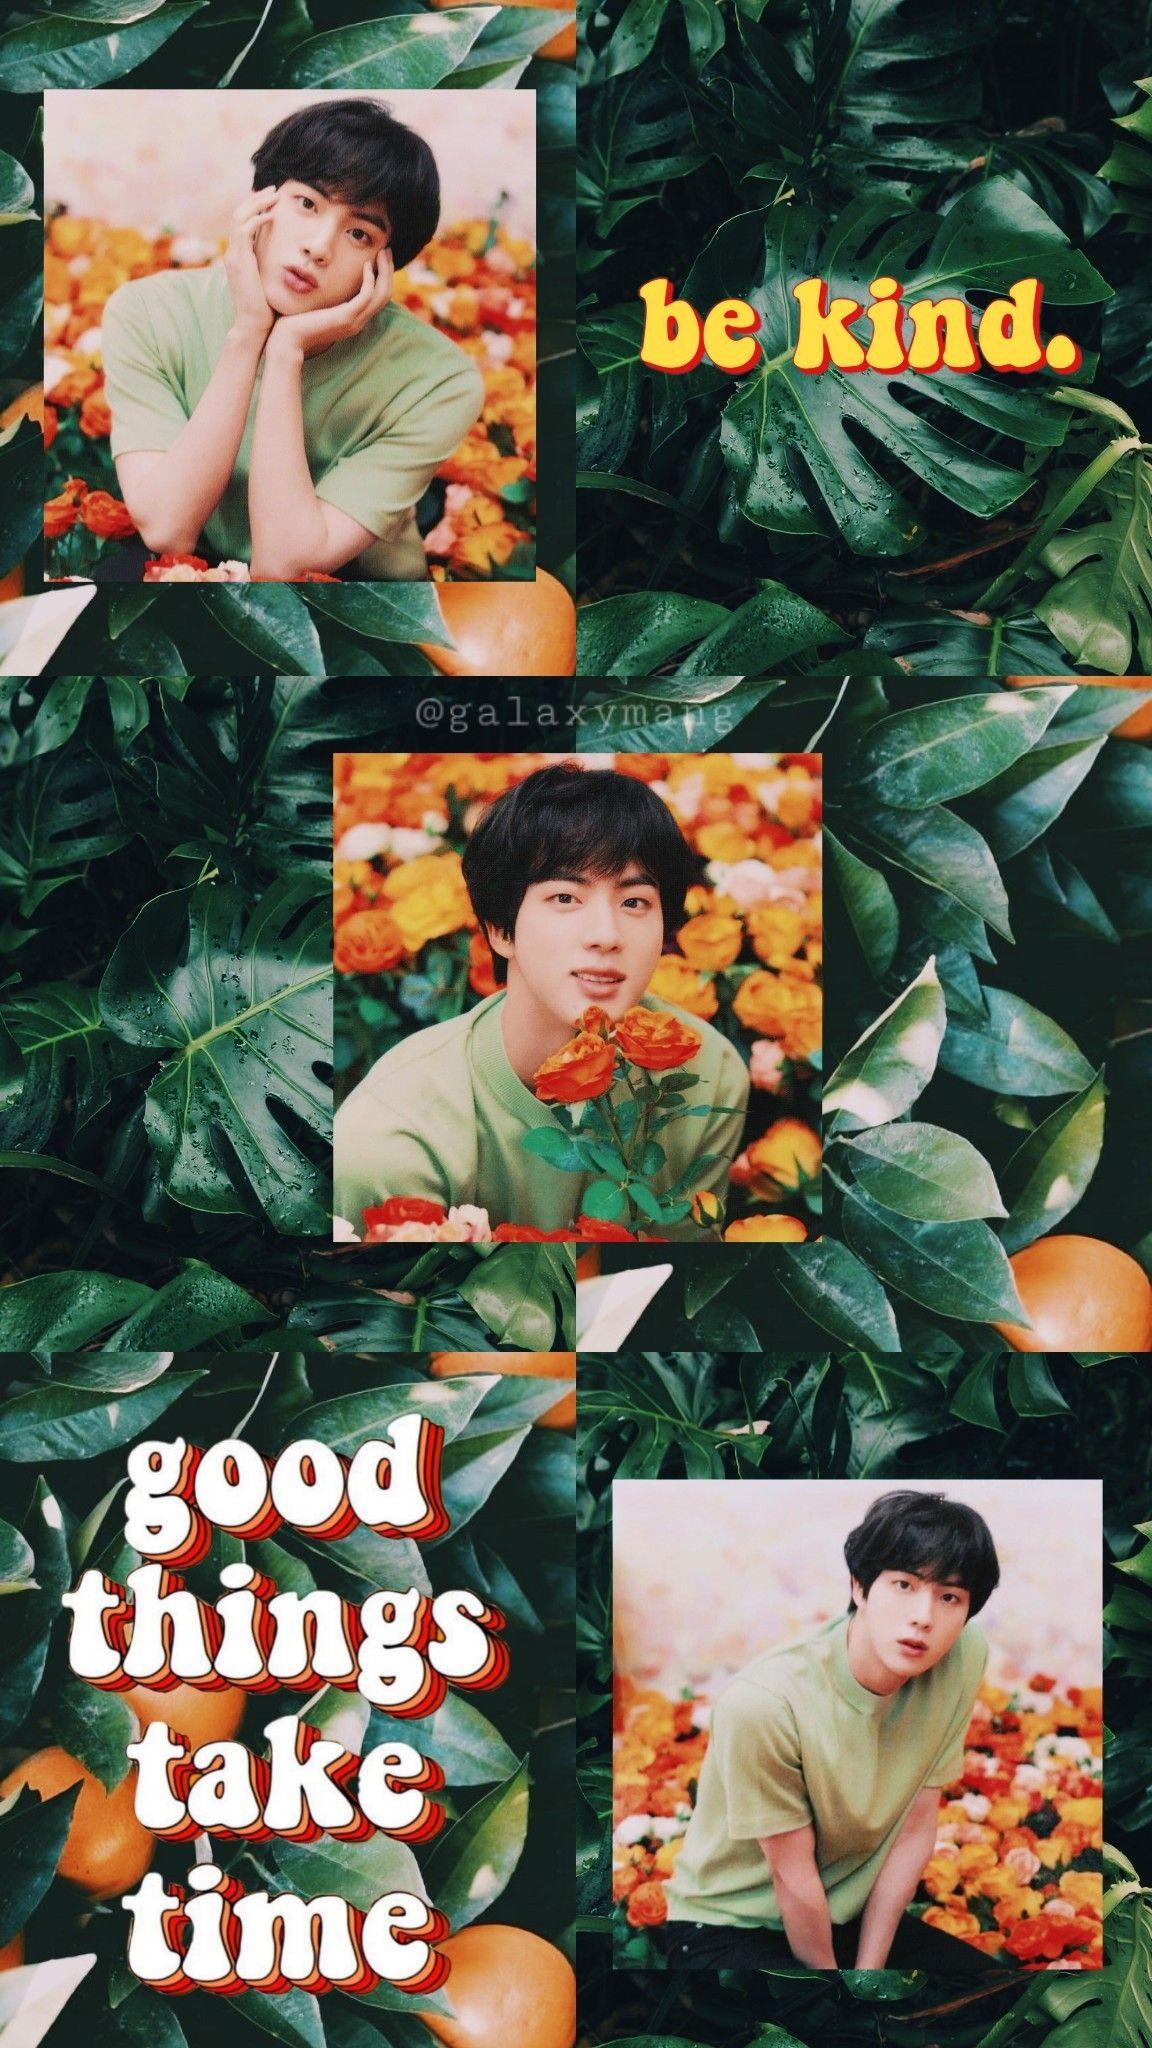 Bts Jin Kim Seokjin Green Wallpaper Aesthetic Bts Aesthetic Wallpaper For Phone Kim Taehyung Wallpaper Seokjin